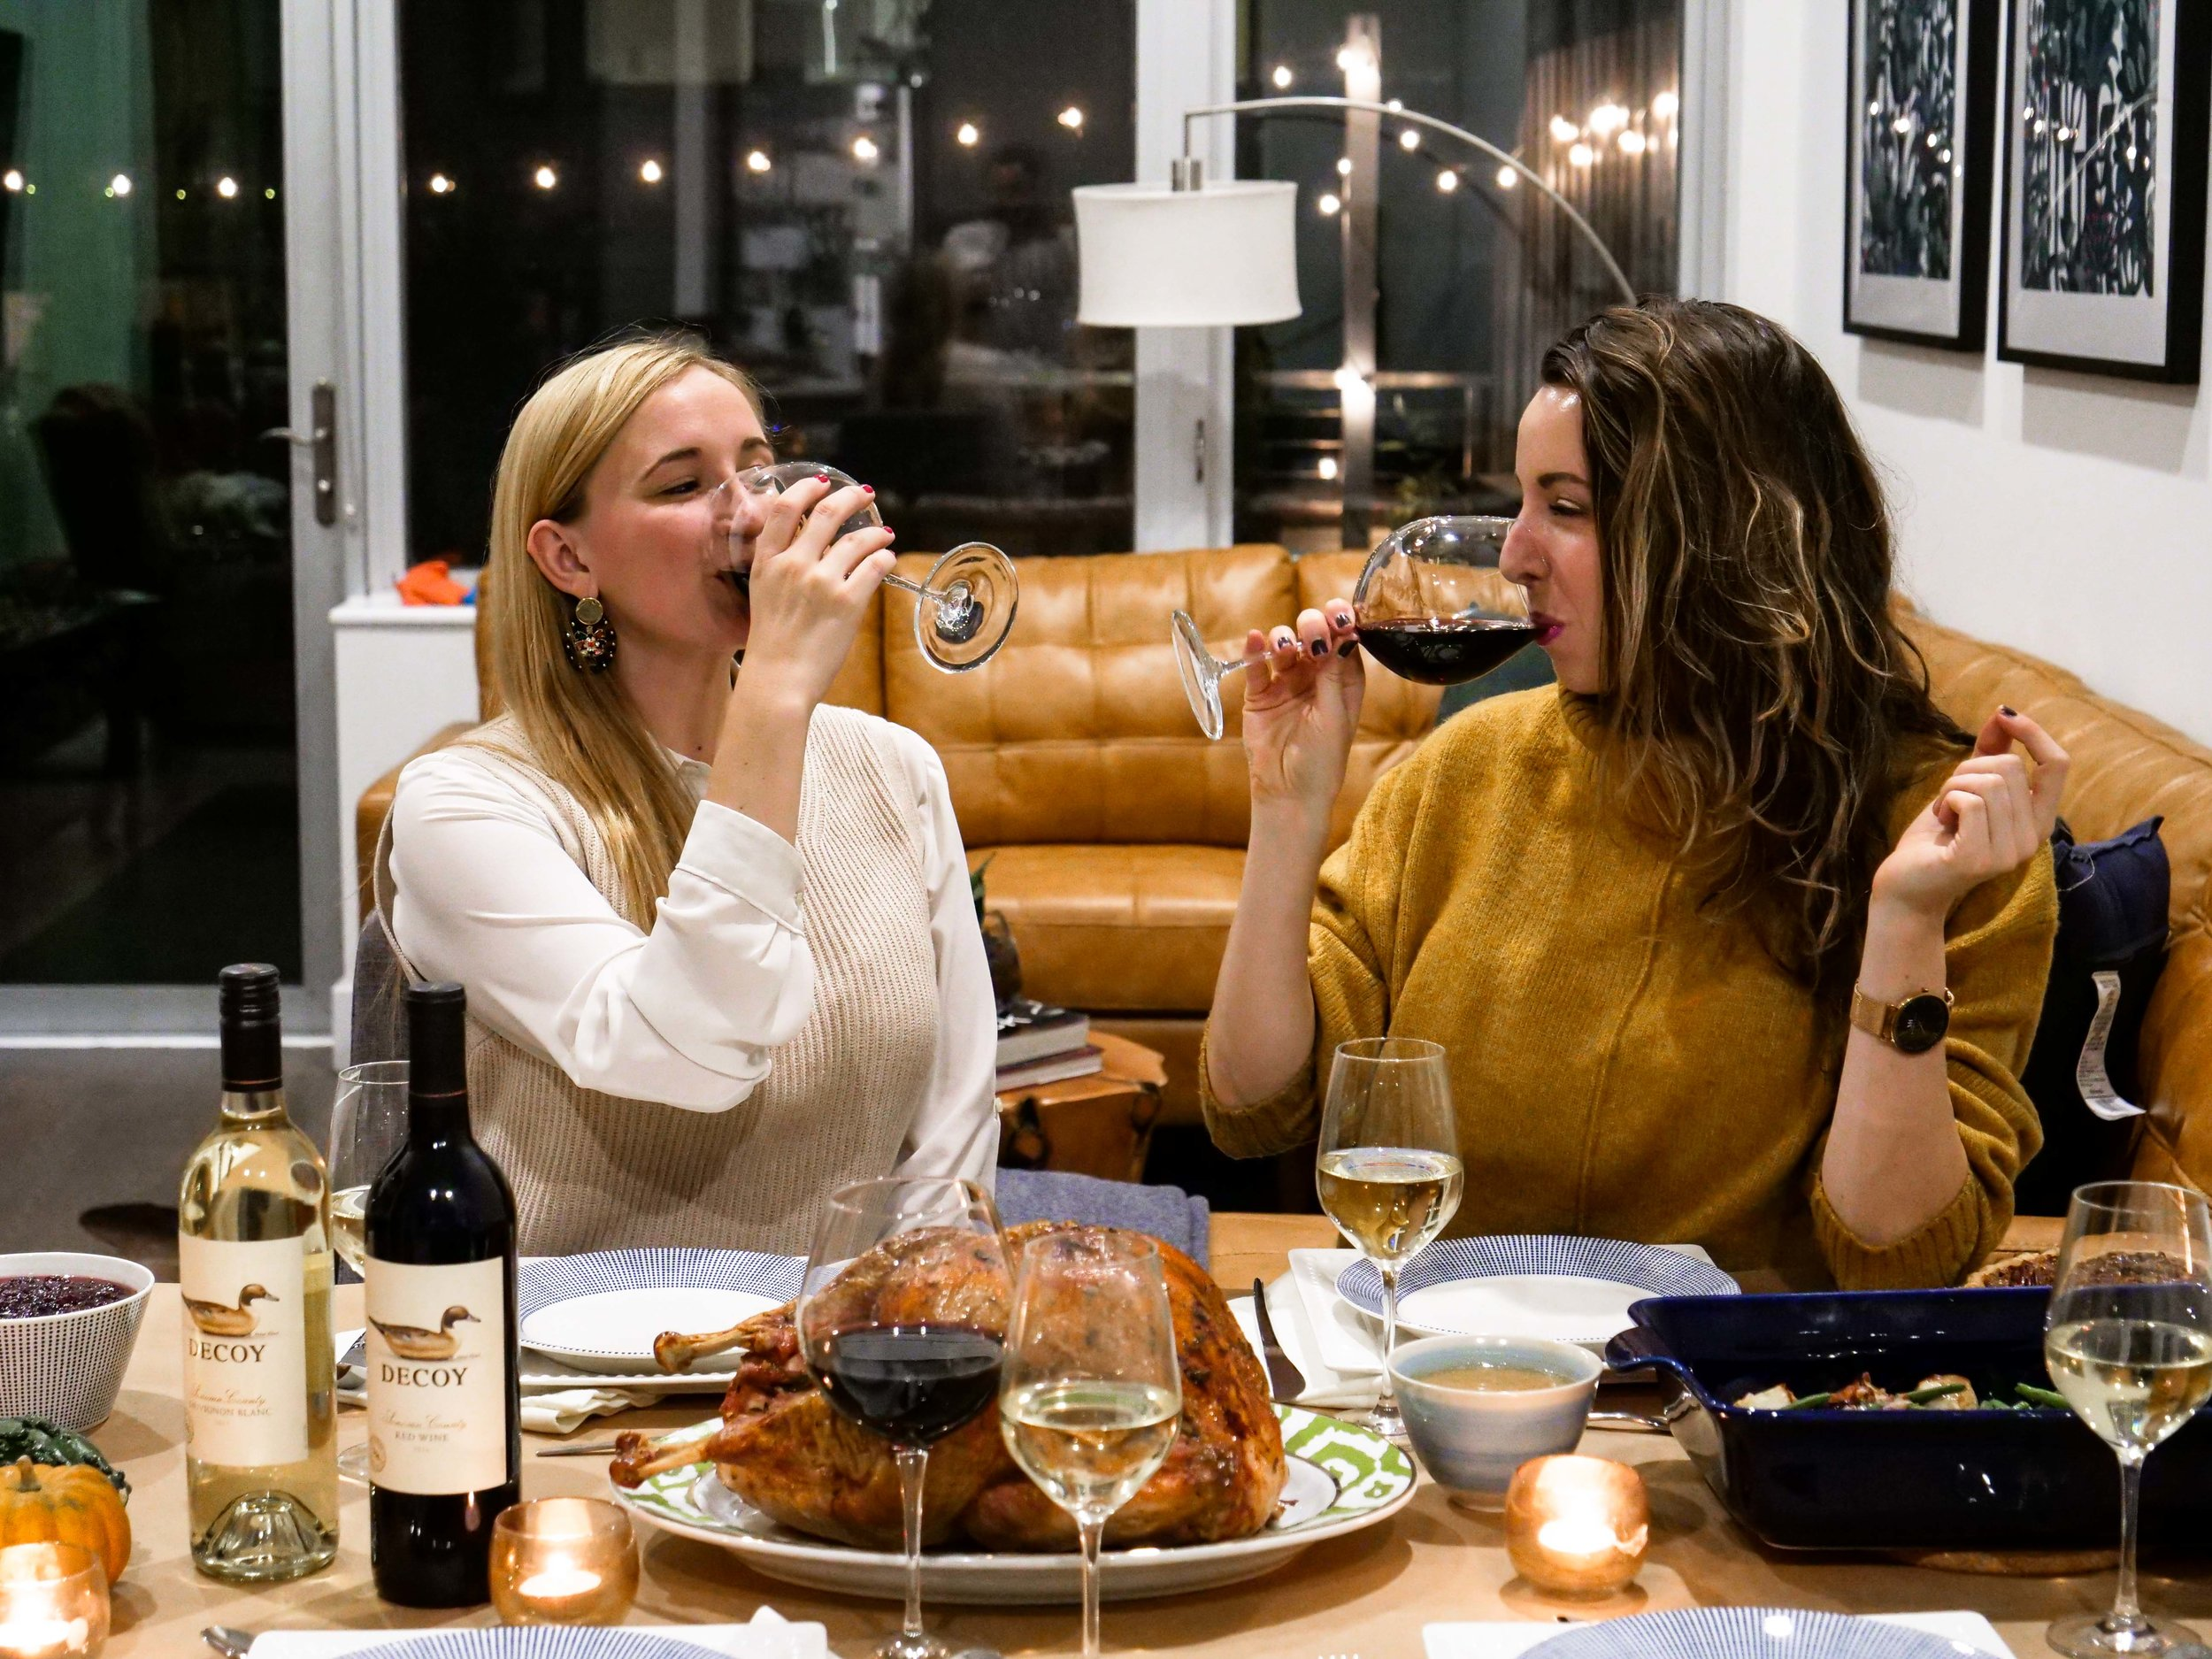 Decoy Wine-6.jpg